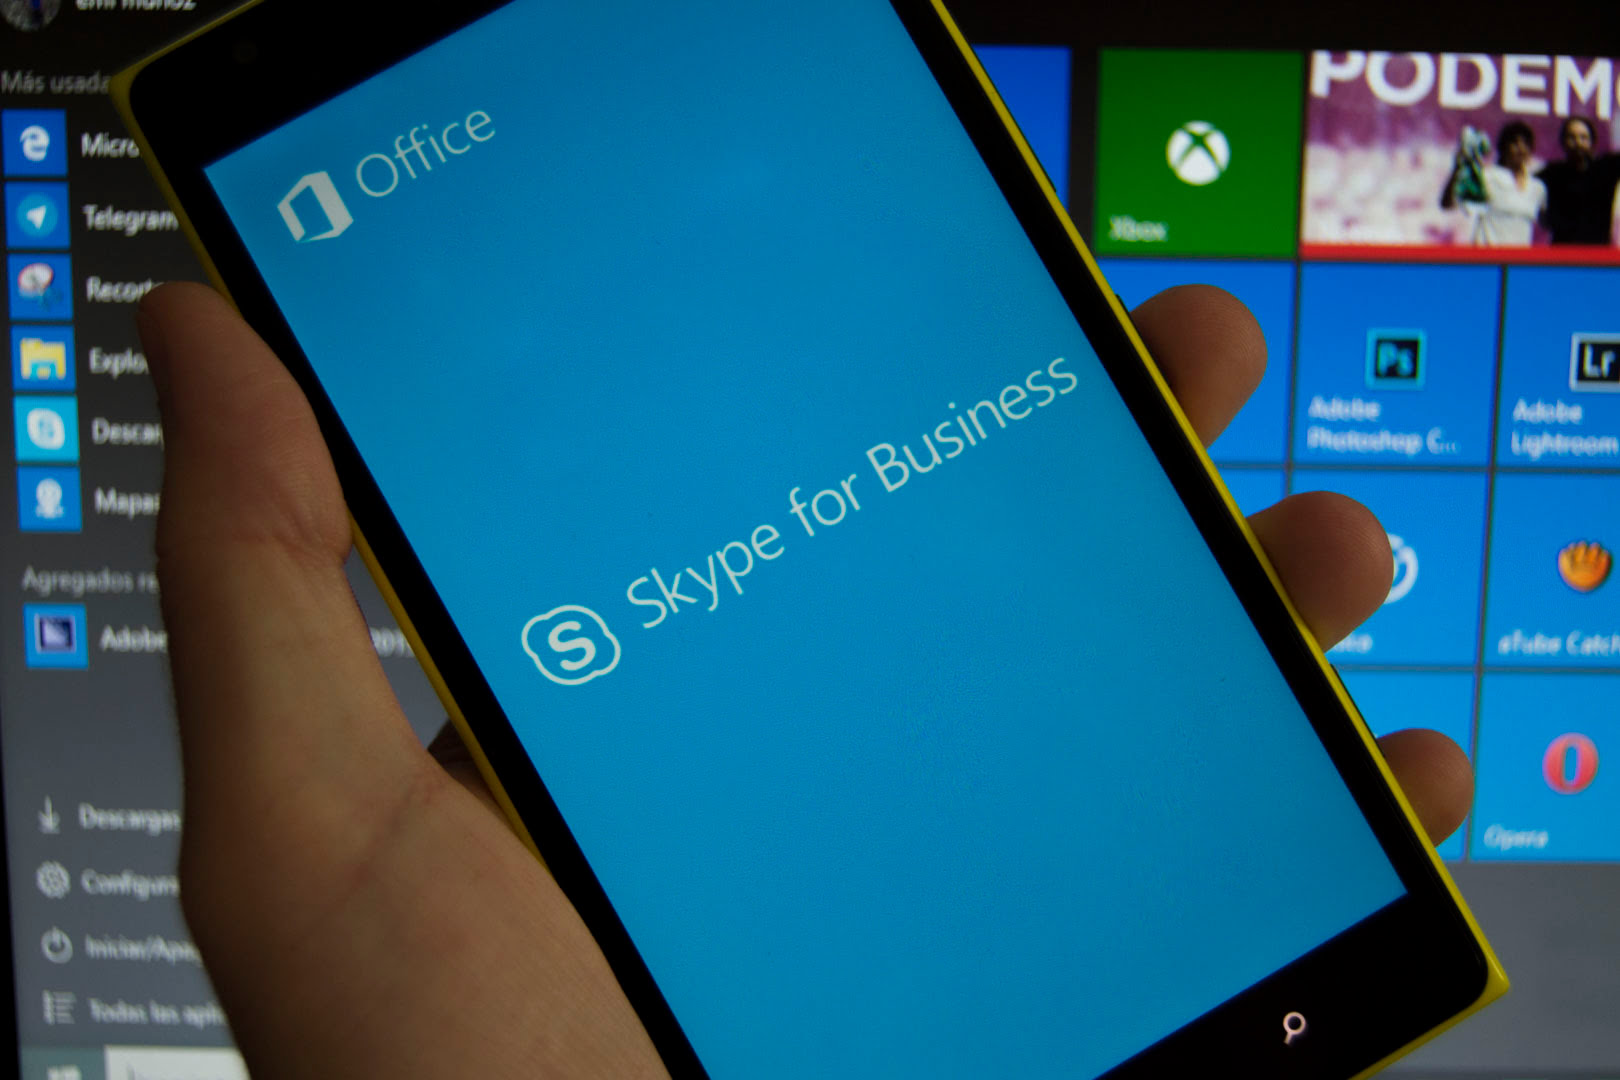 Ya está disponible Skype Empresarial para Windows Phone